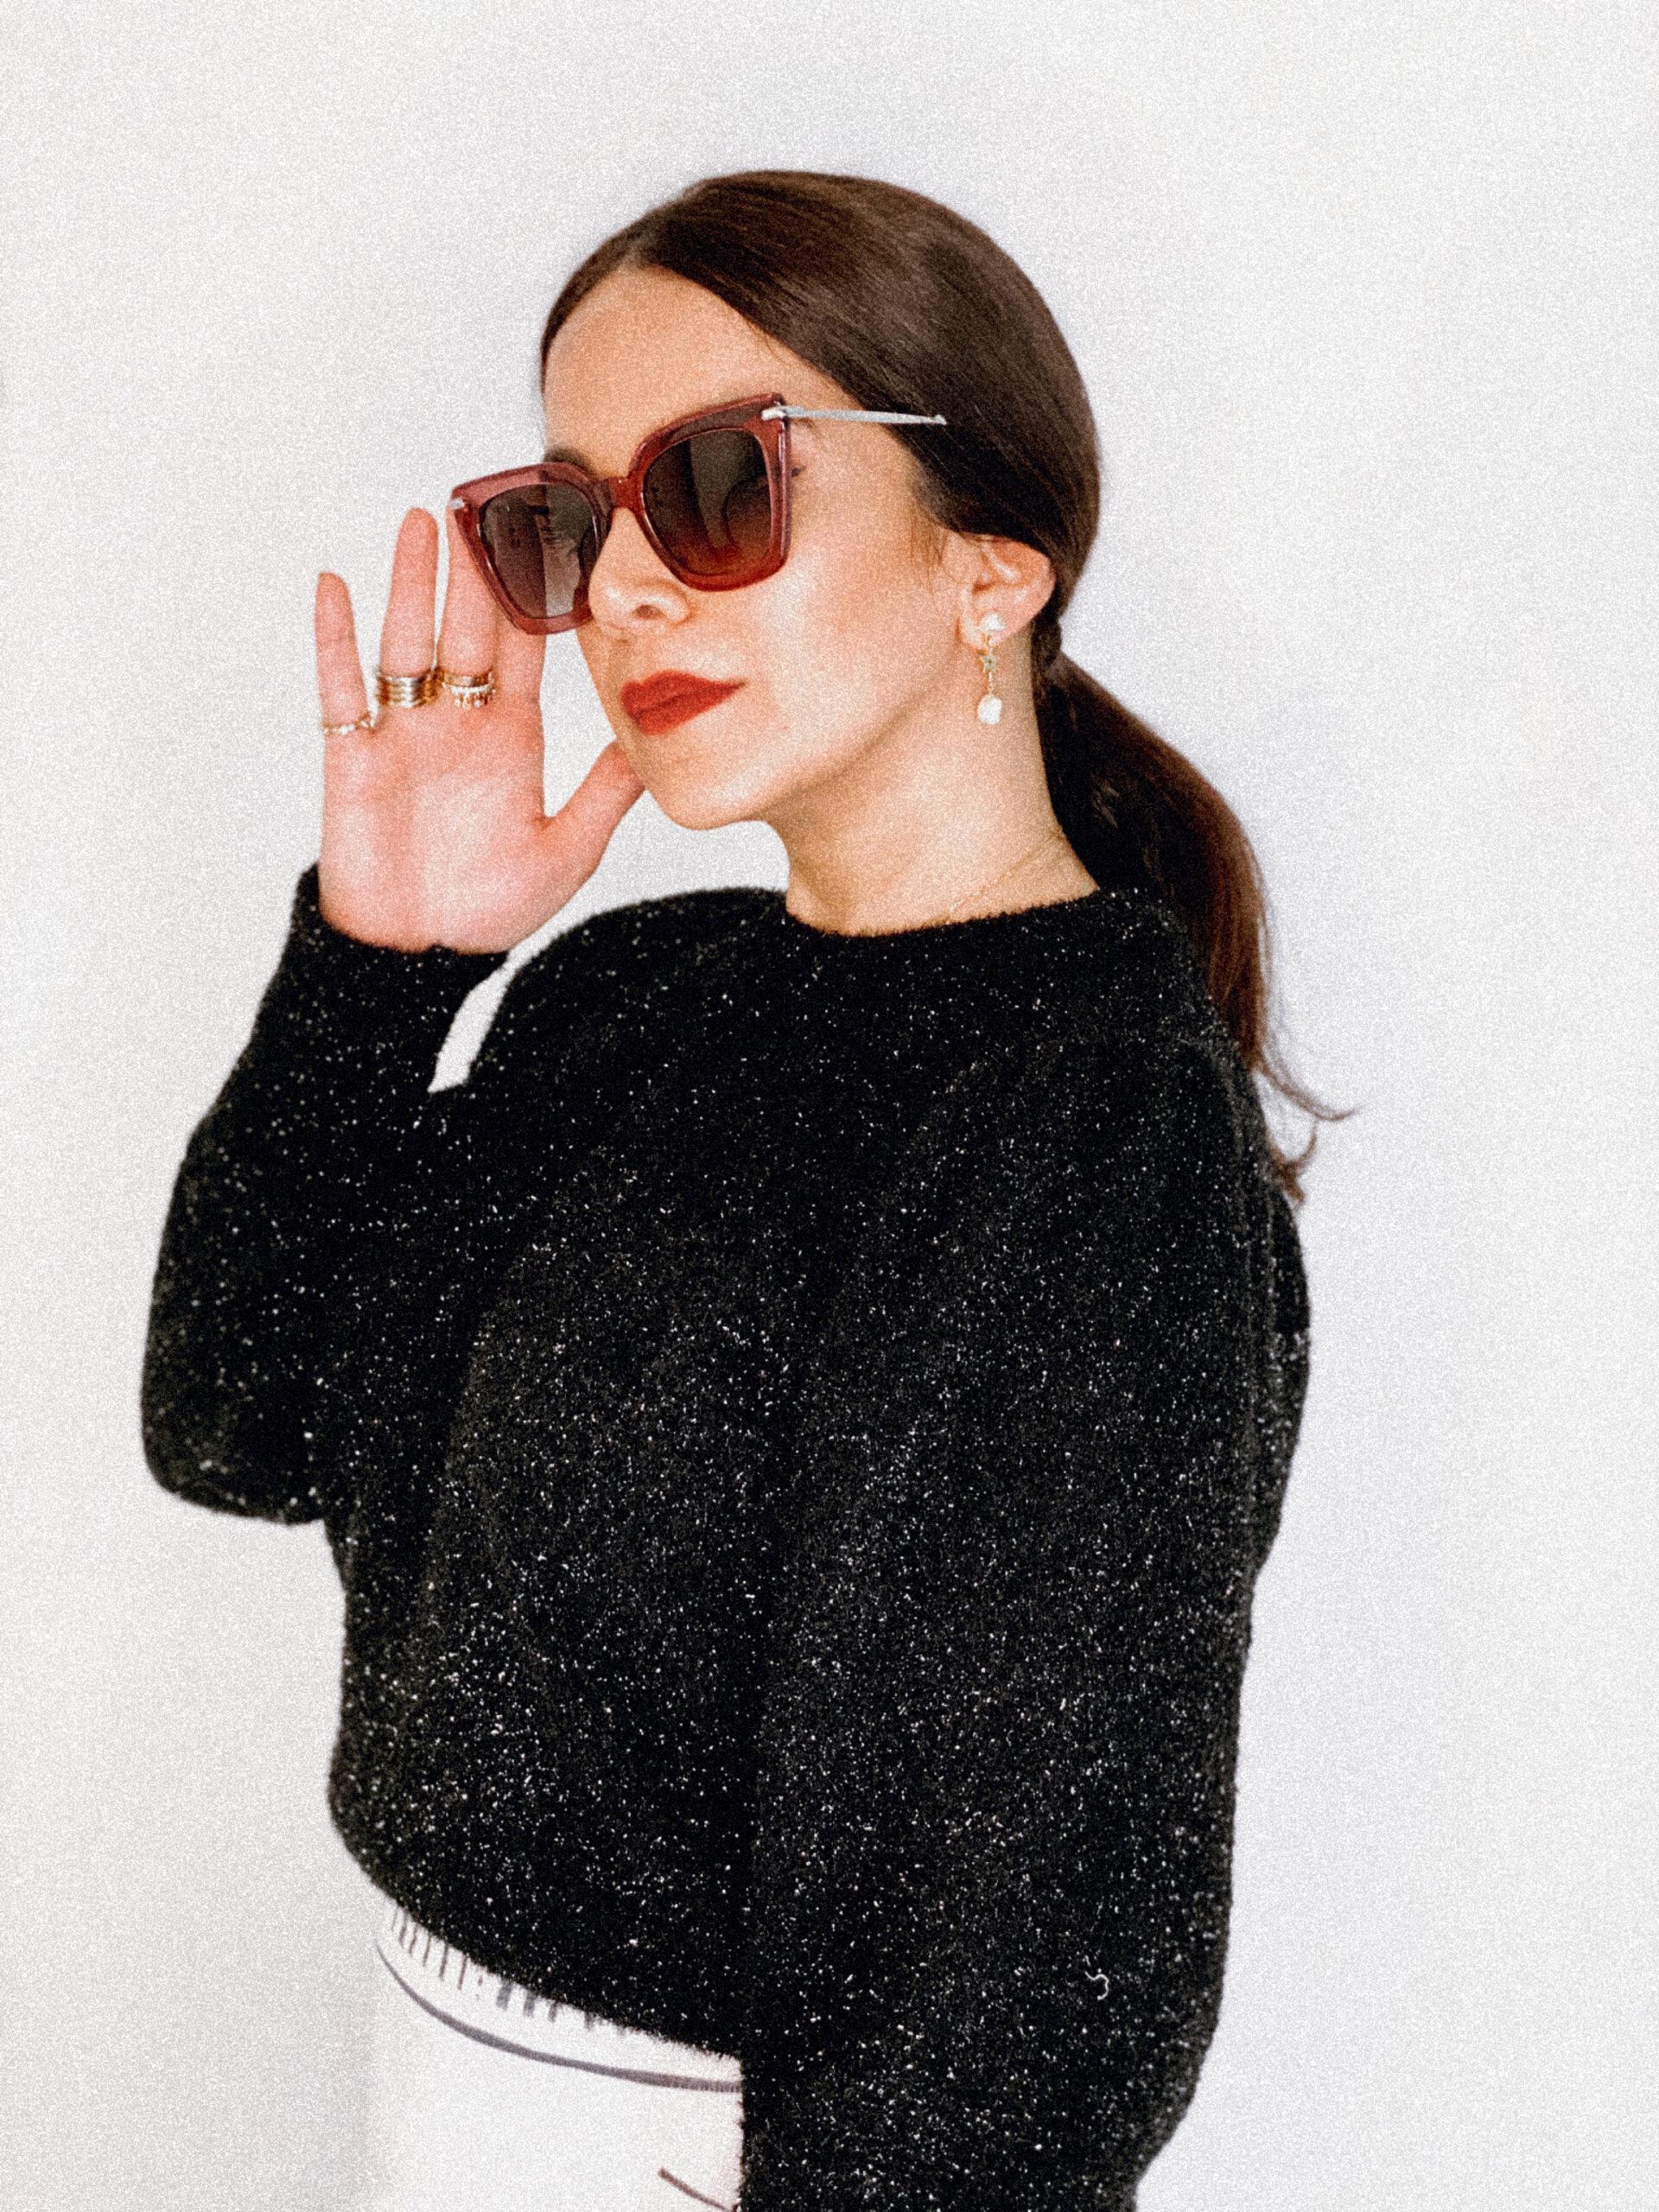 jimmy choo cat eye sunglasses on zahra lyla khalil